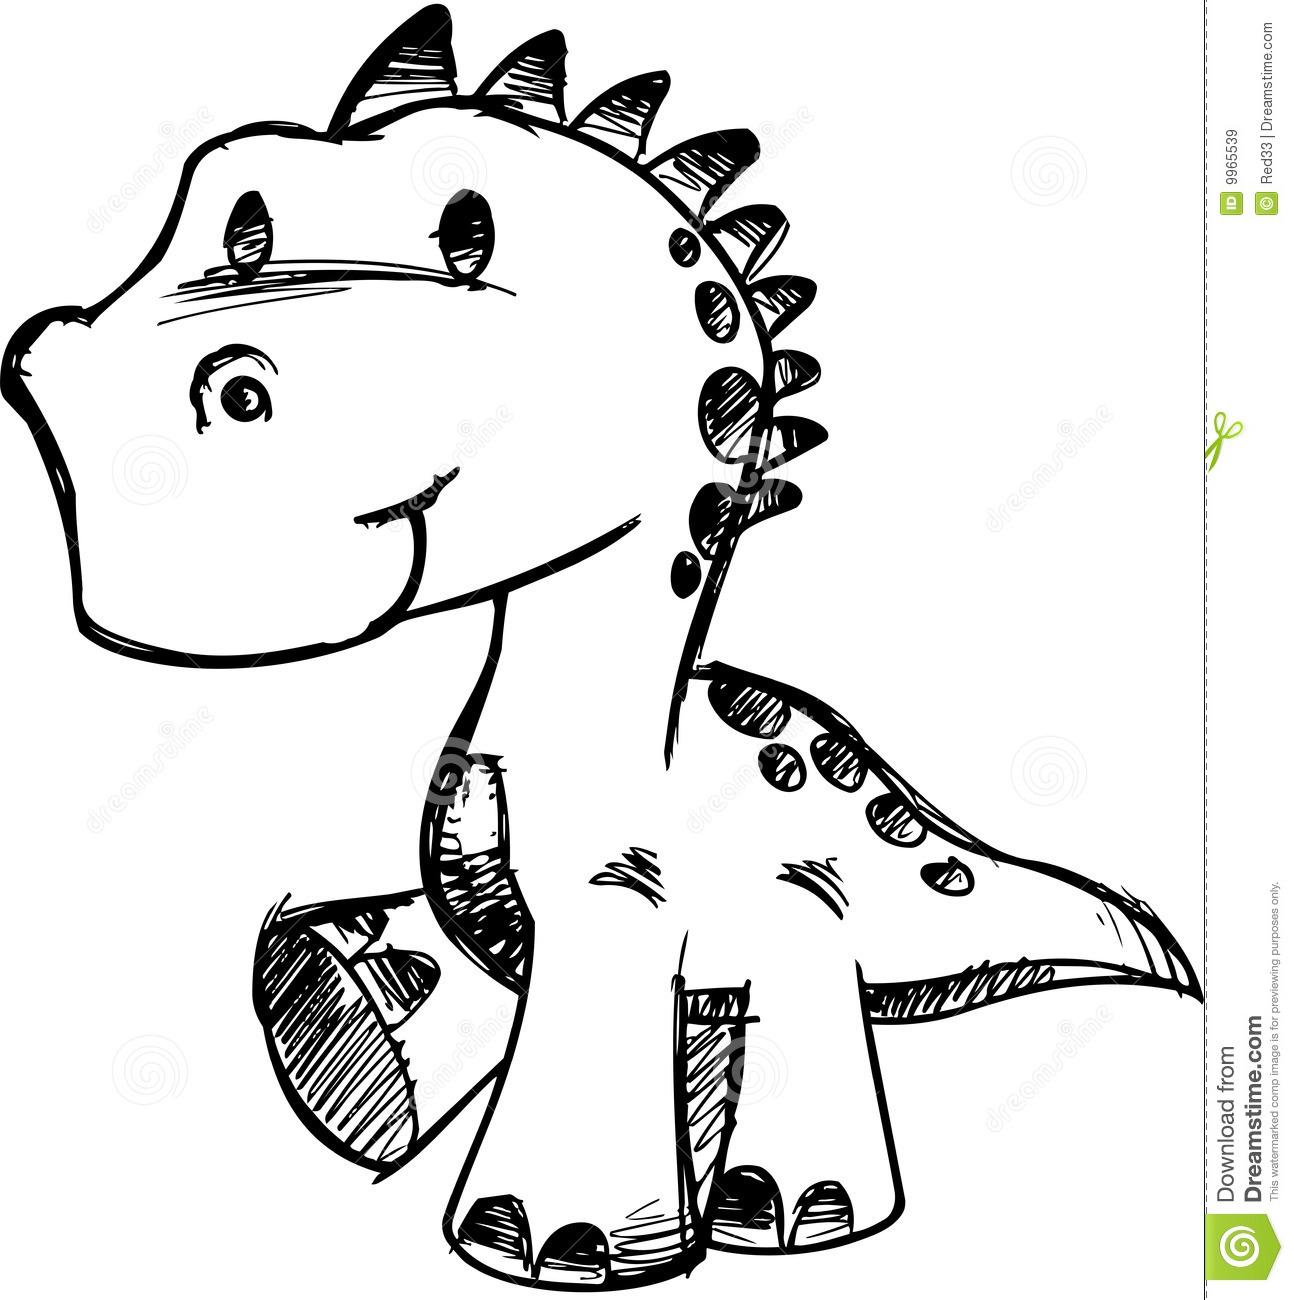 1294x1300 Cute Dinosaur Drawing How To Draw A Dinosaur Cute Dinosaur Easy